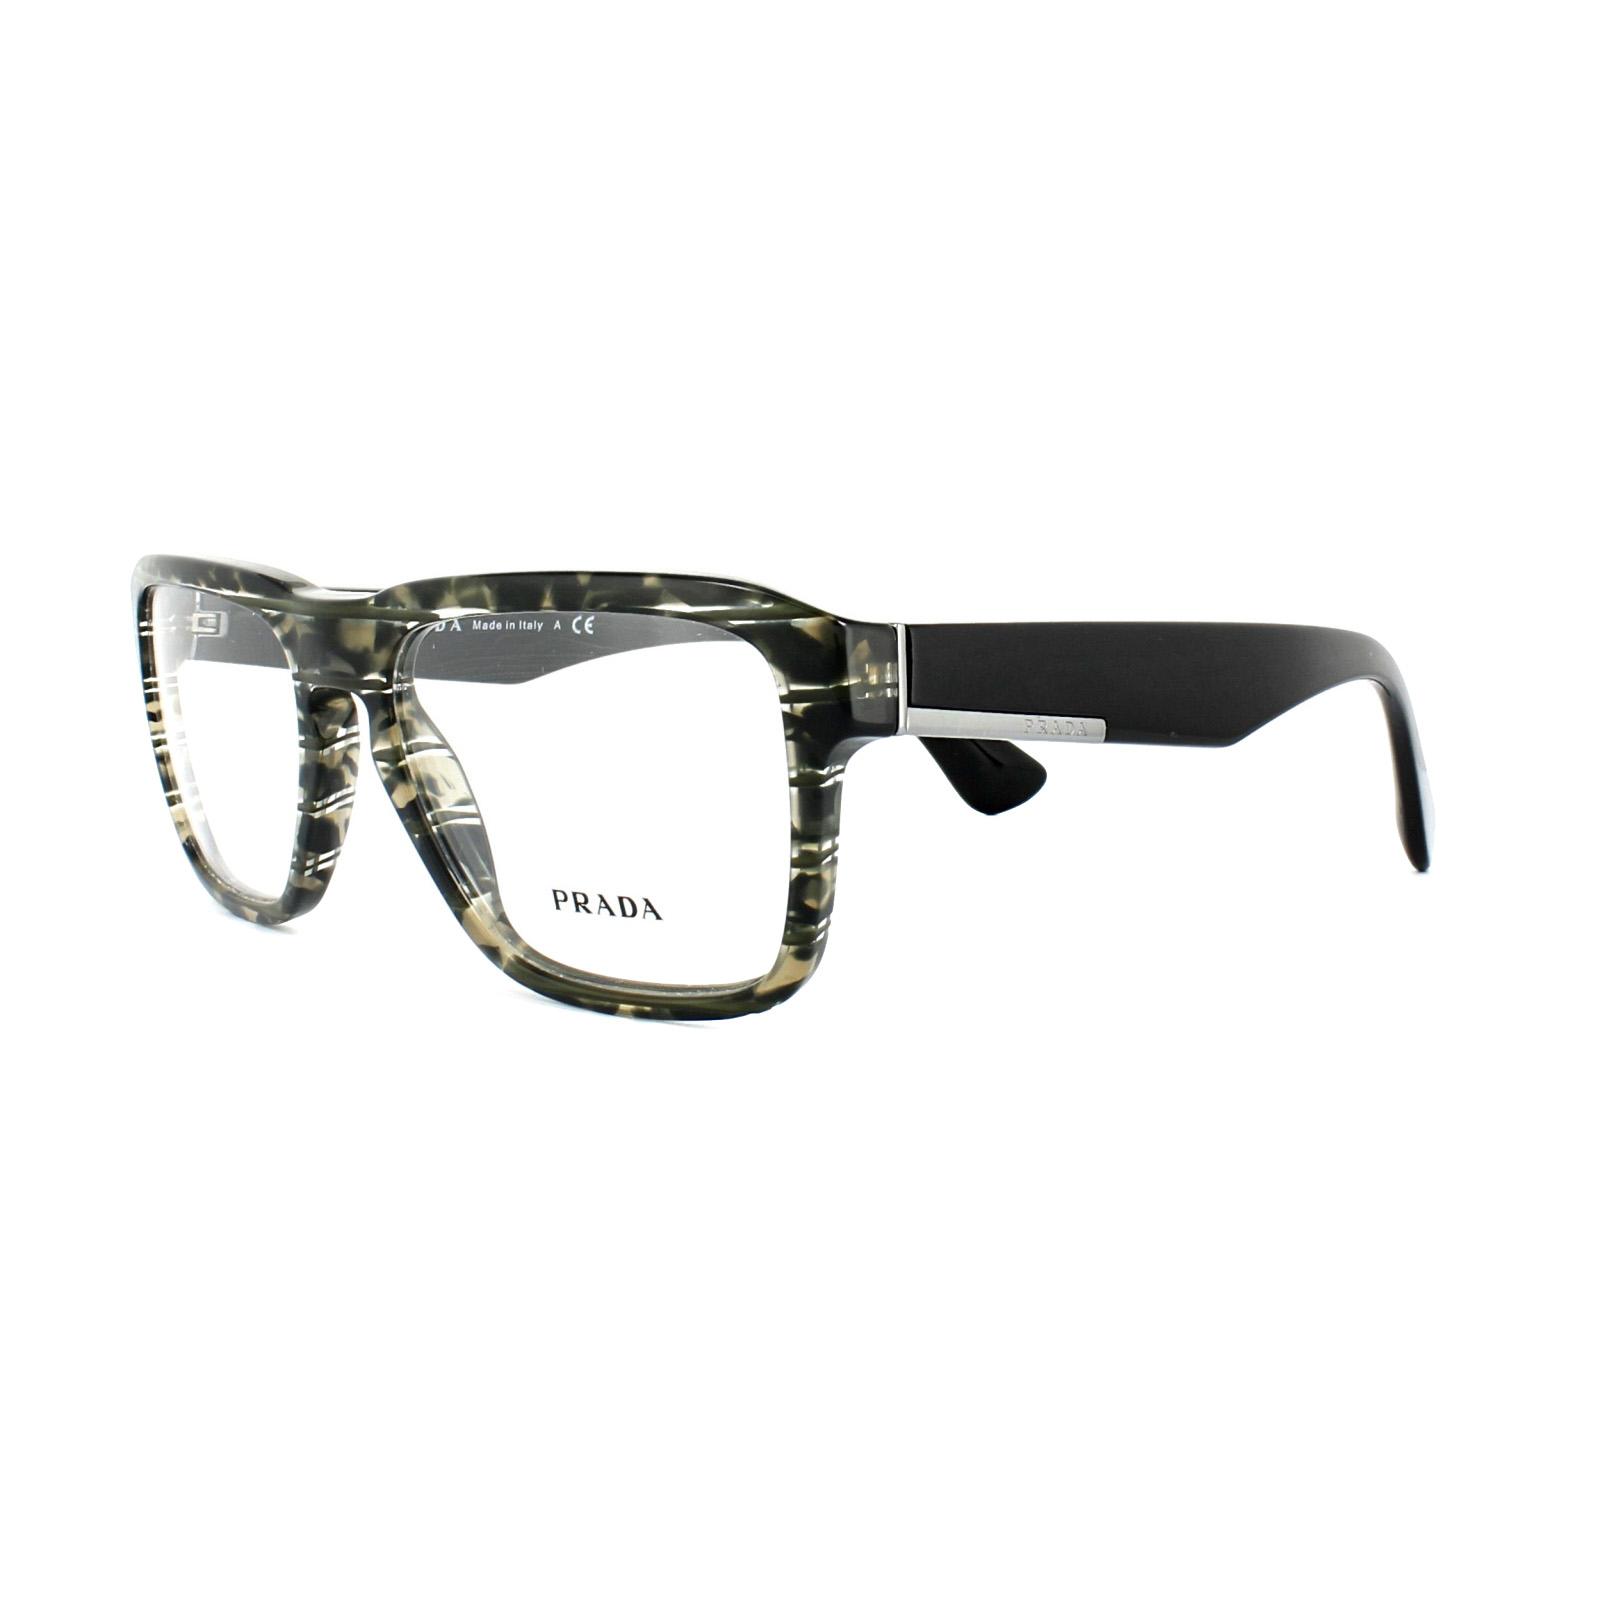 43ce96b09c20 ... women myopia glasses frames new style sentinel prada glasses frames pr  04sv ube1o1 green line tortoise mens 53mm 91395 e8e88 ...